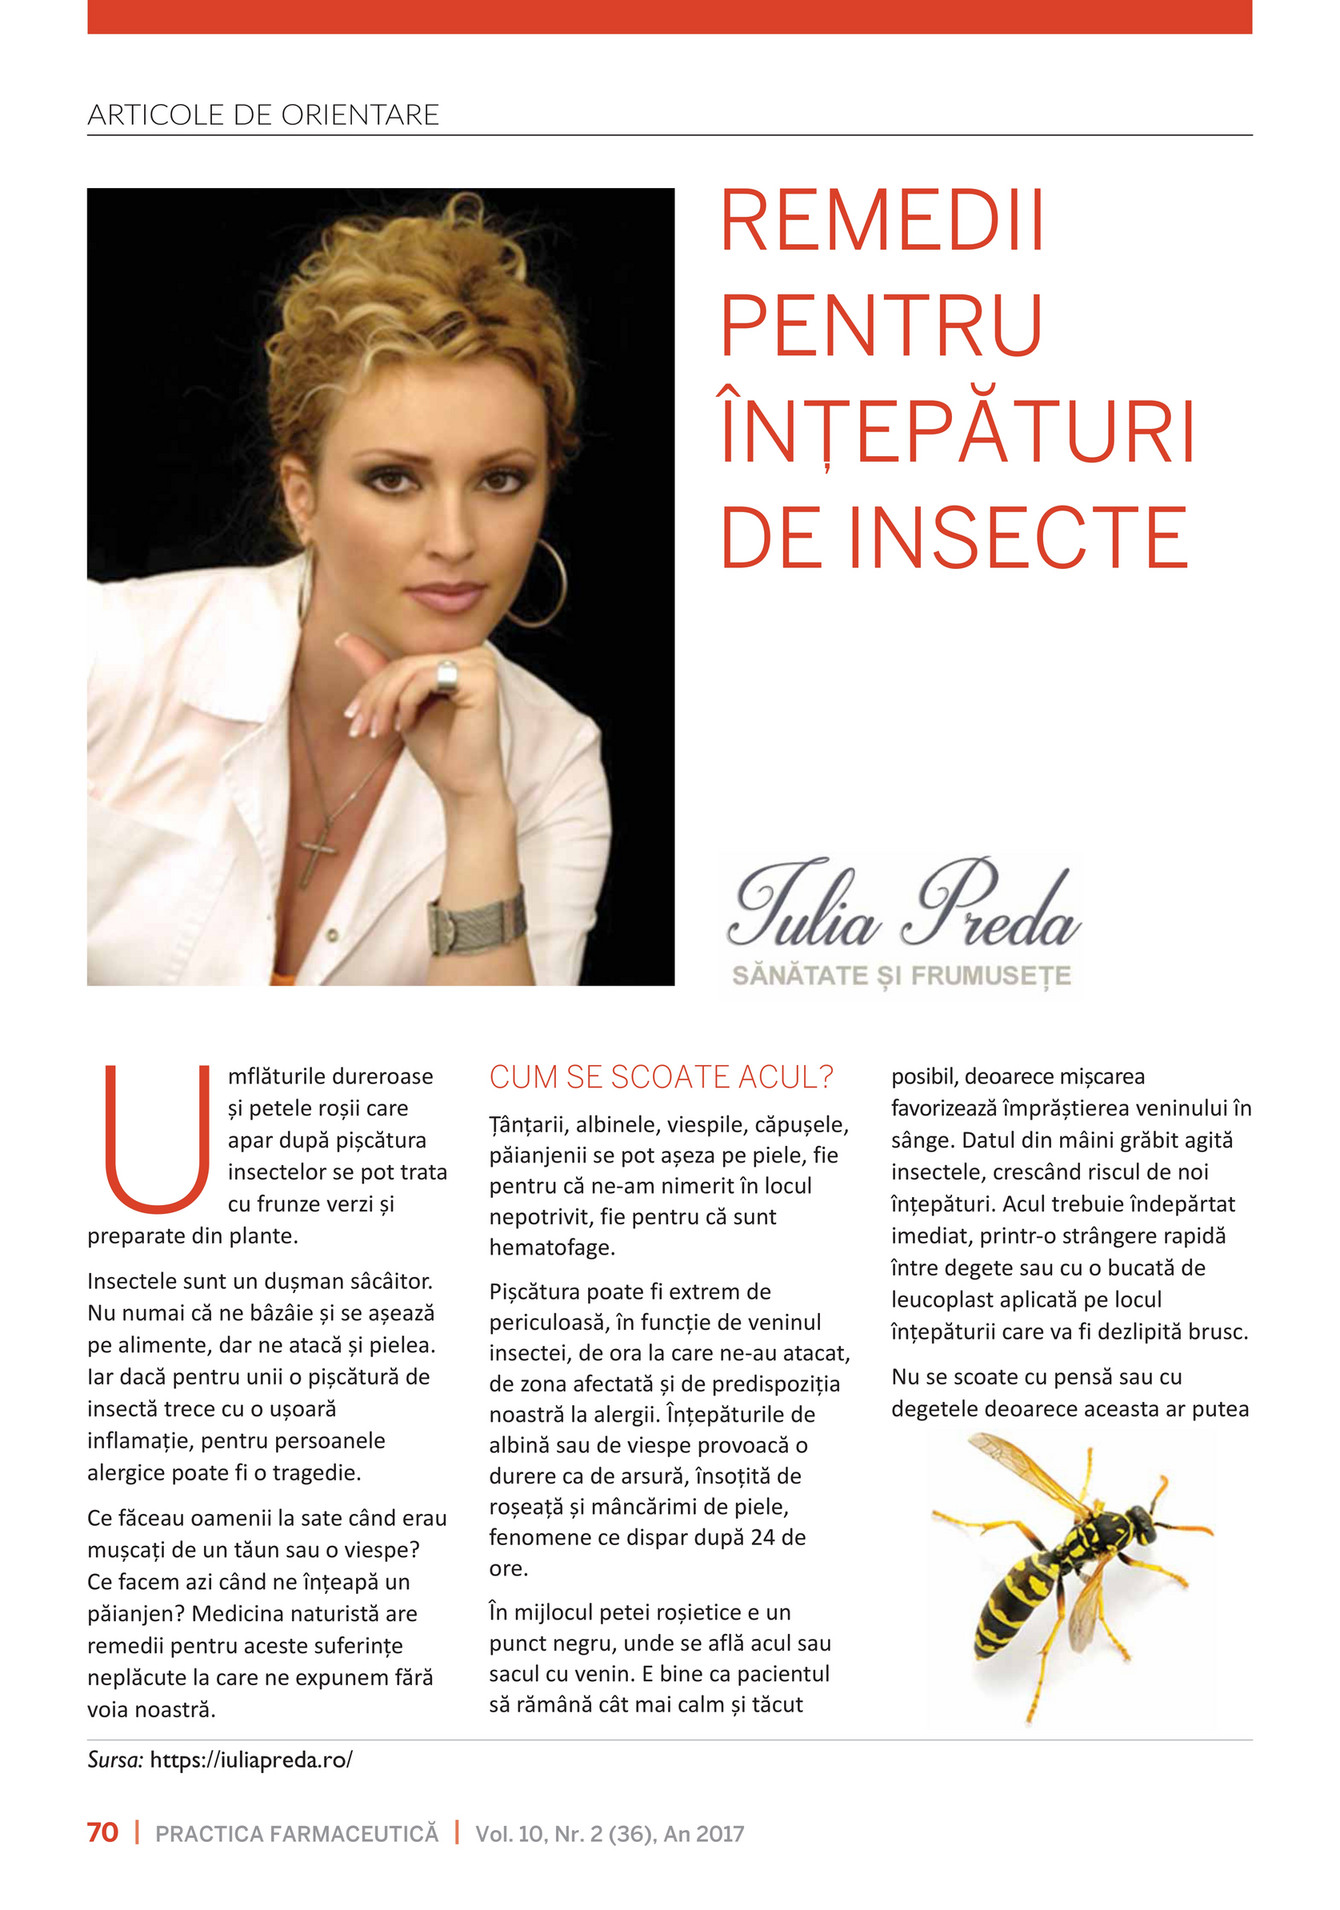 insectele pot fi mitol